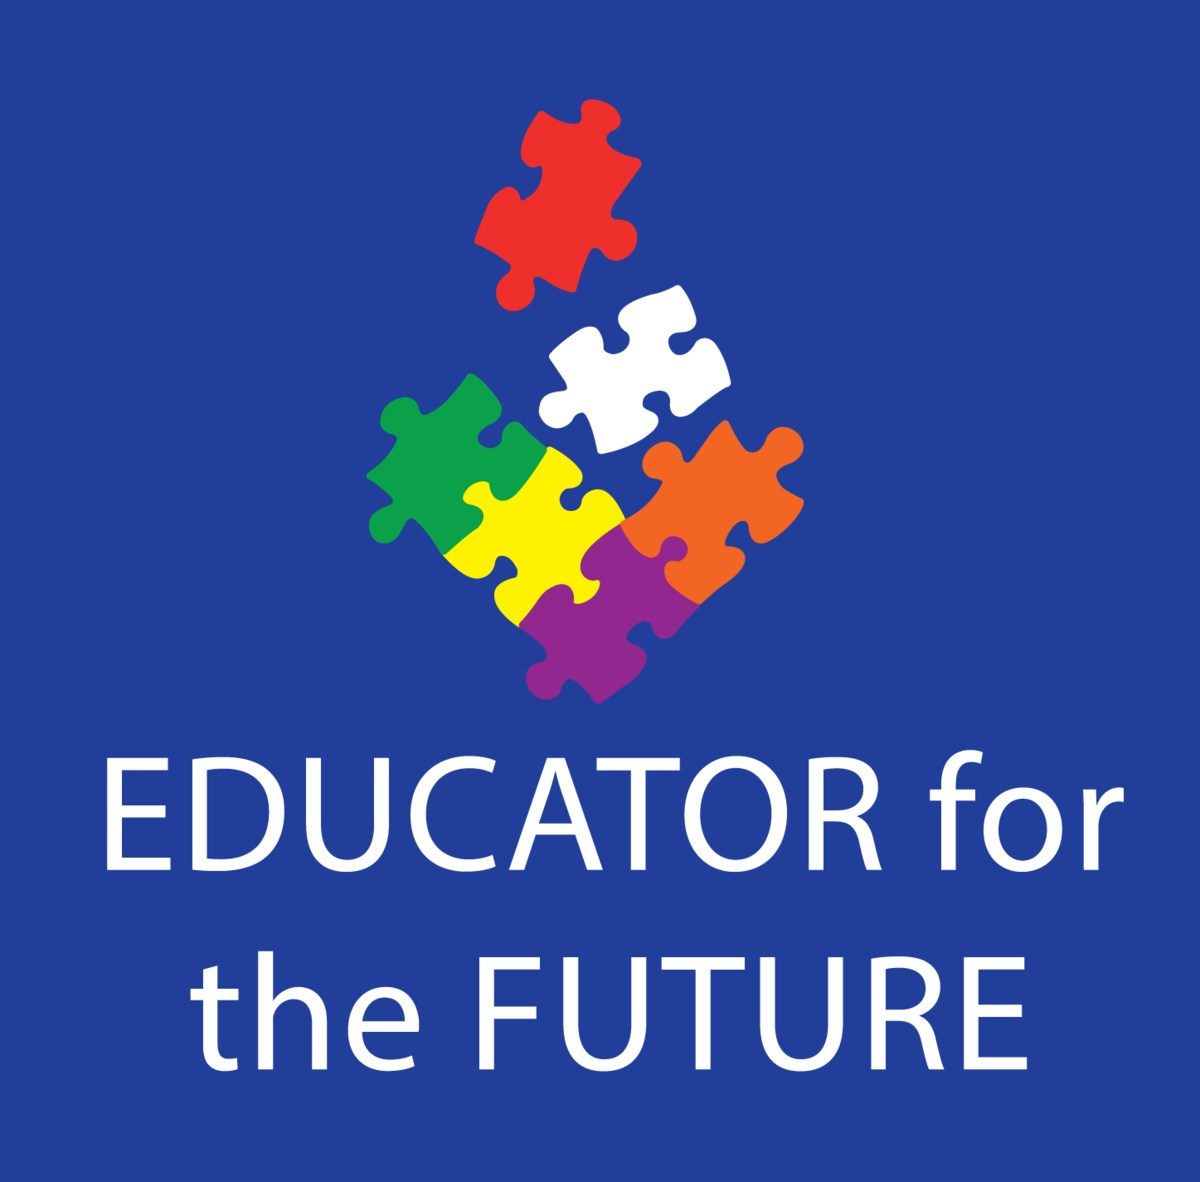 Educator for the Future graphic